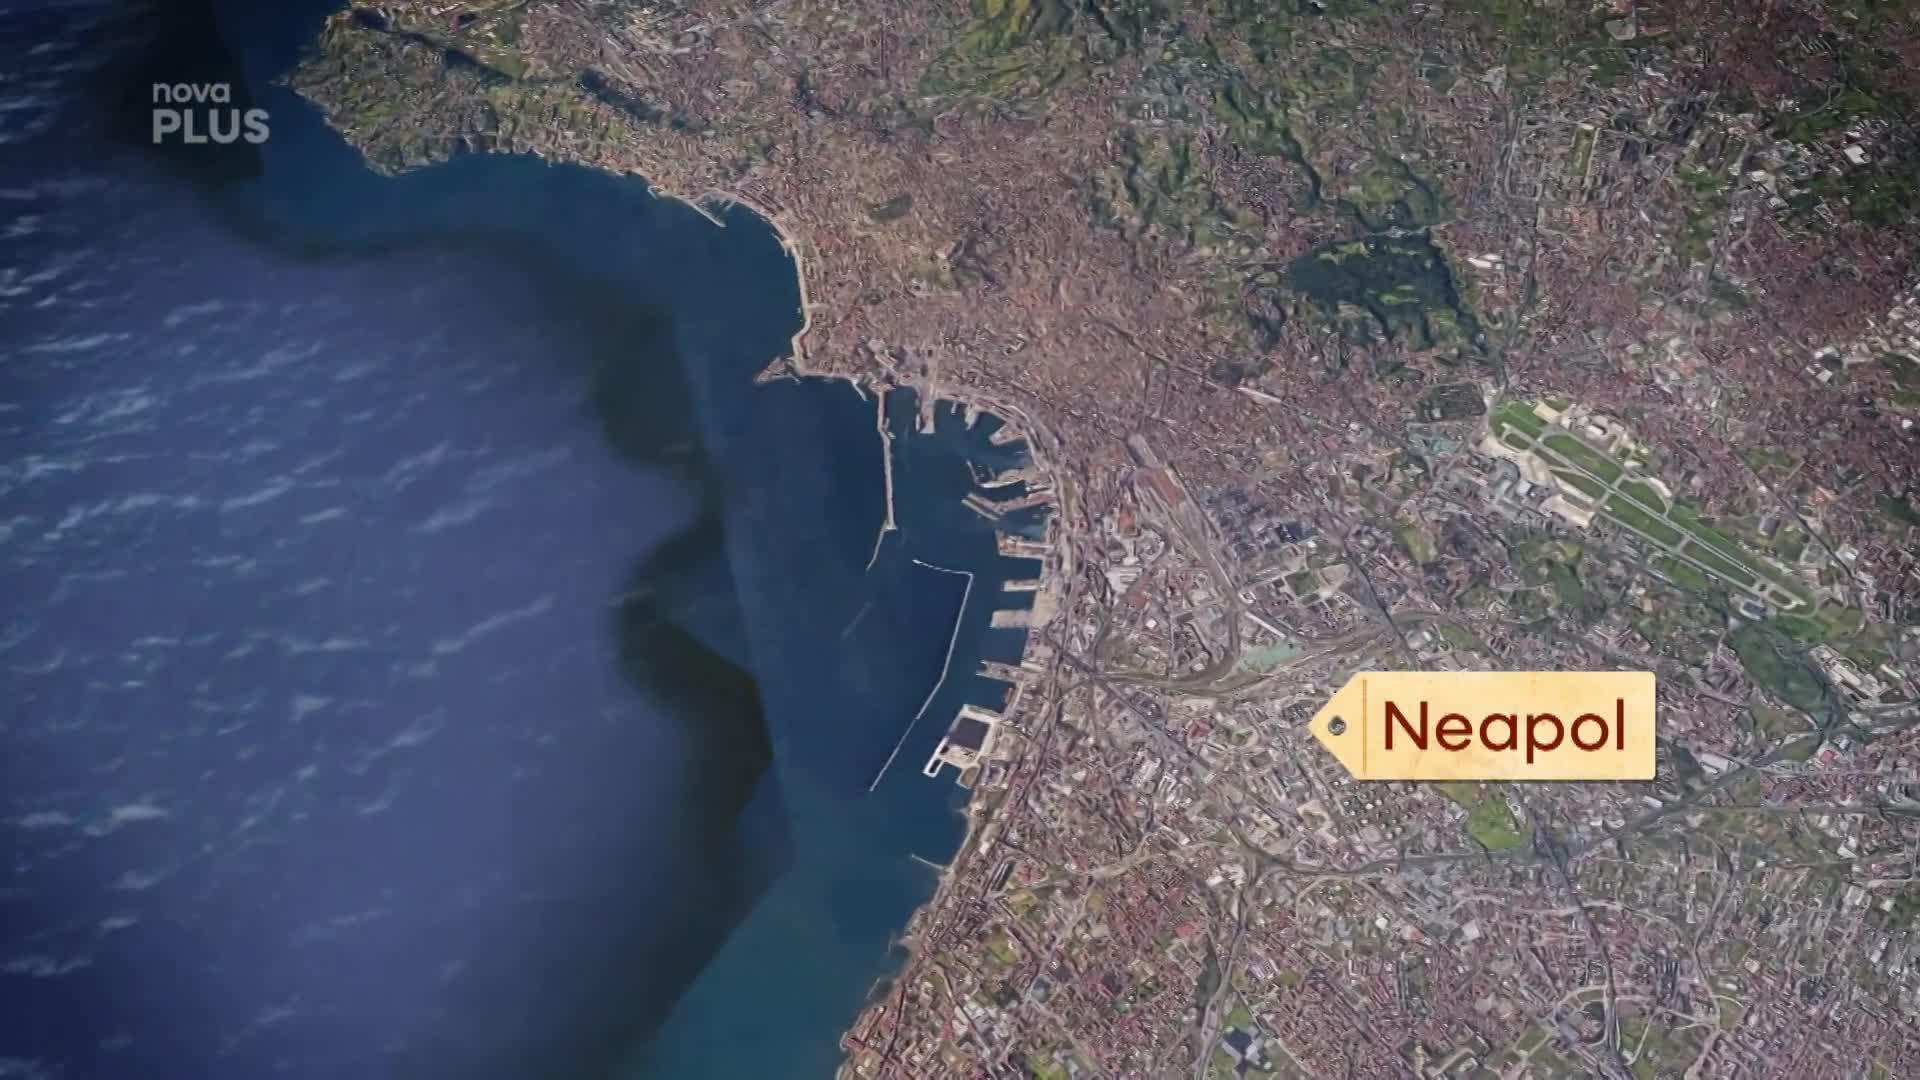 Tajemní Etruskové: Cenné artefakty skrývá neapolské muzeum